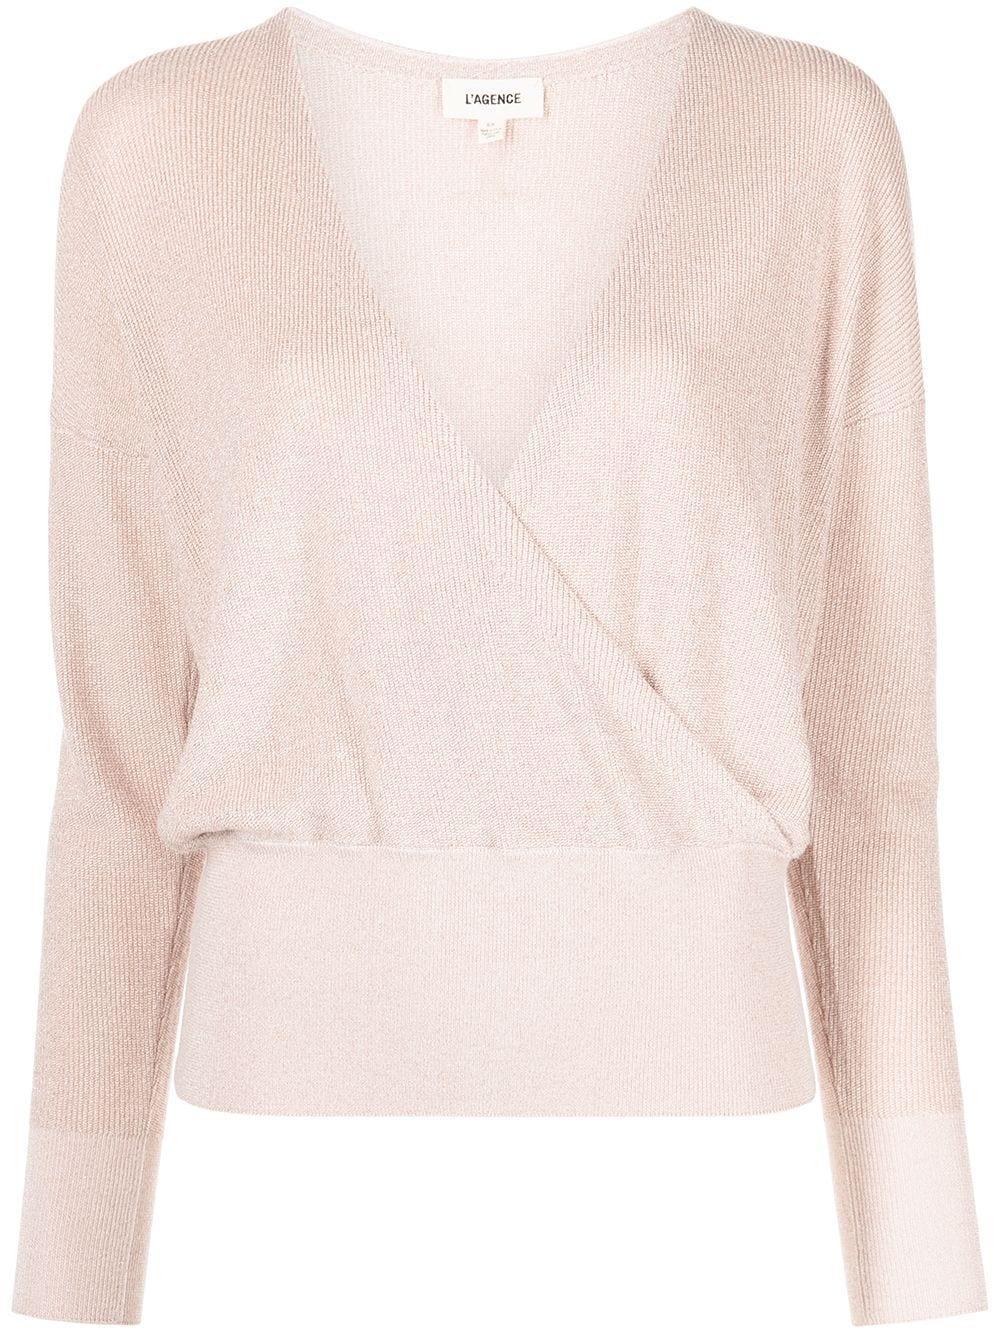 Blair Sweater Item # 8500RKP